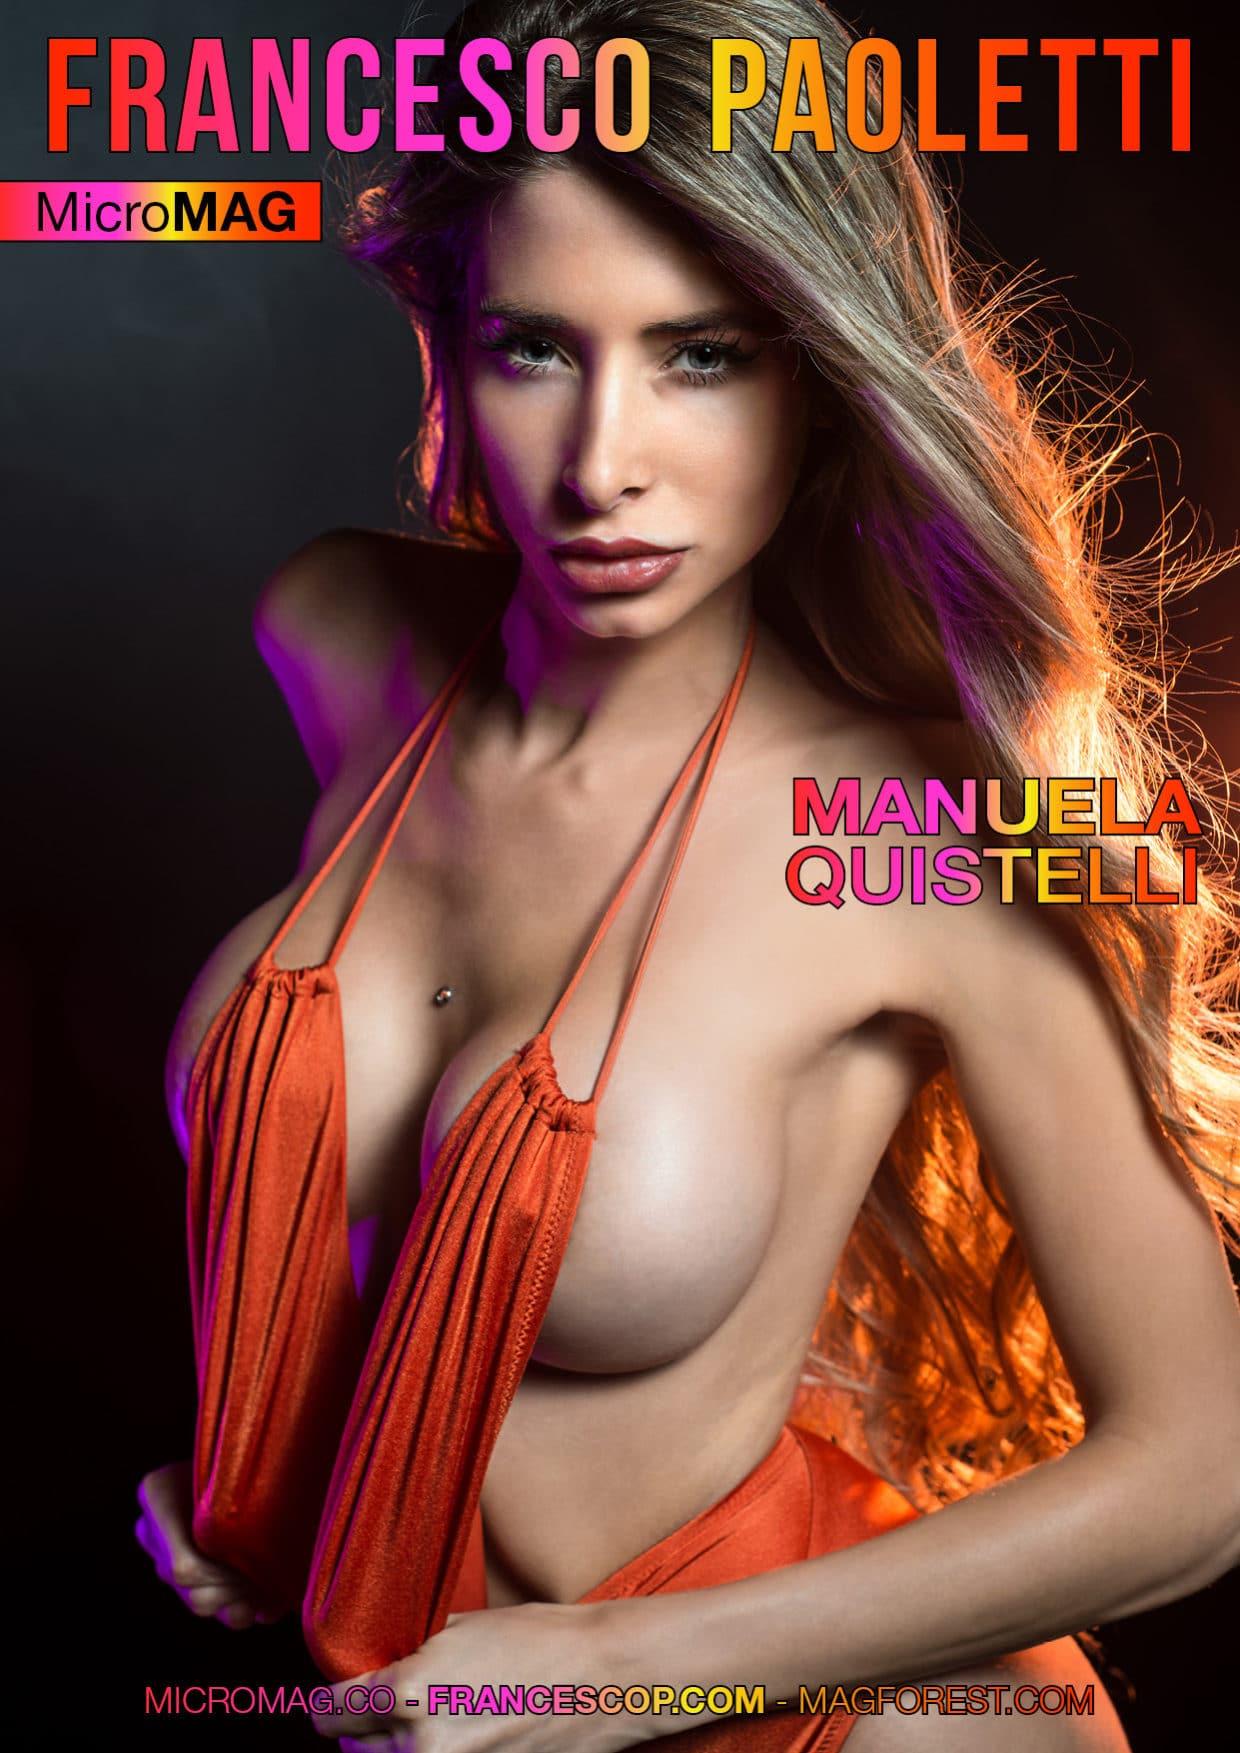 Francesco Paoletti MicroMAG - Manuela Quistelli 1